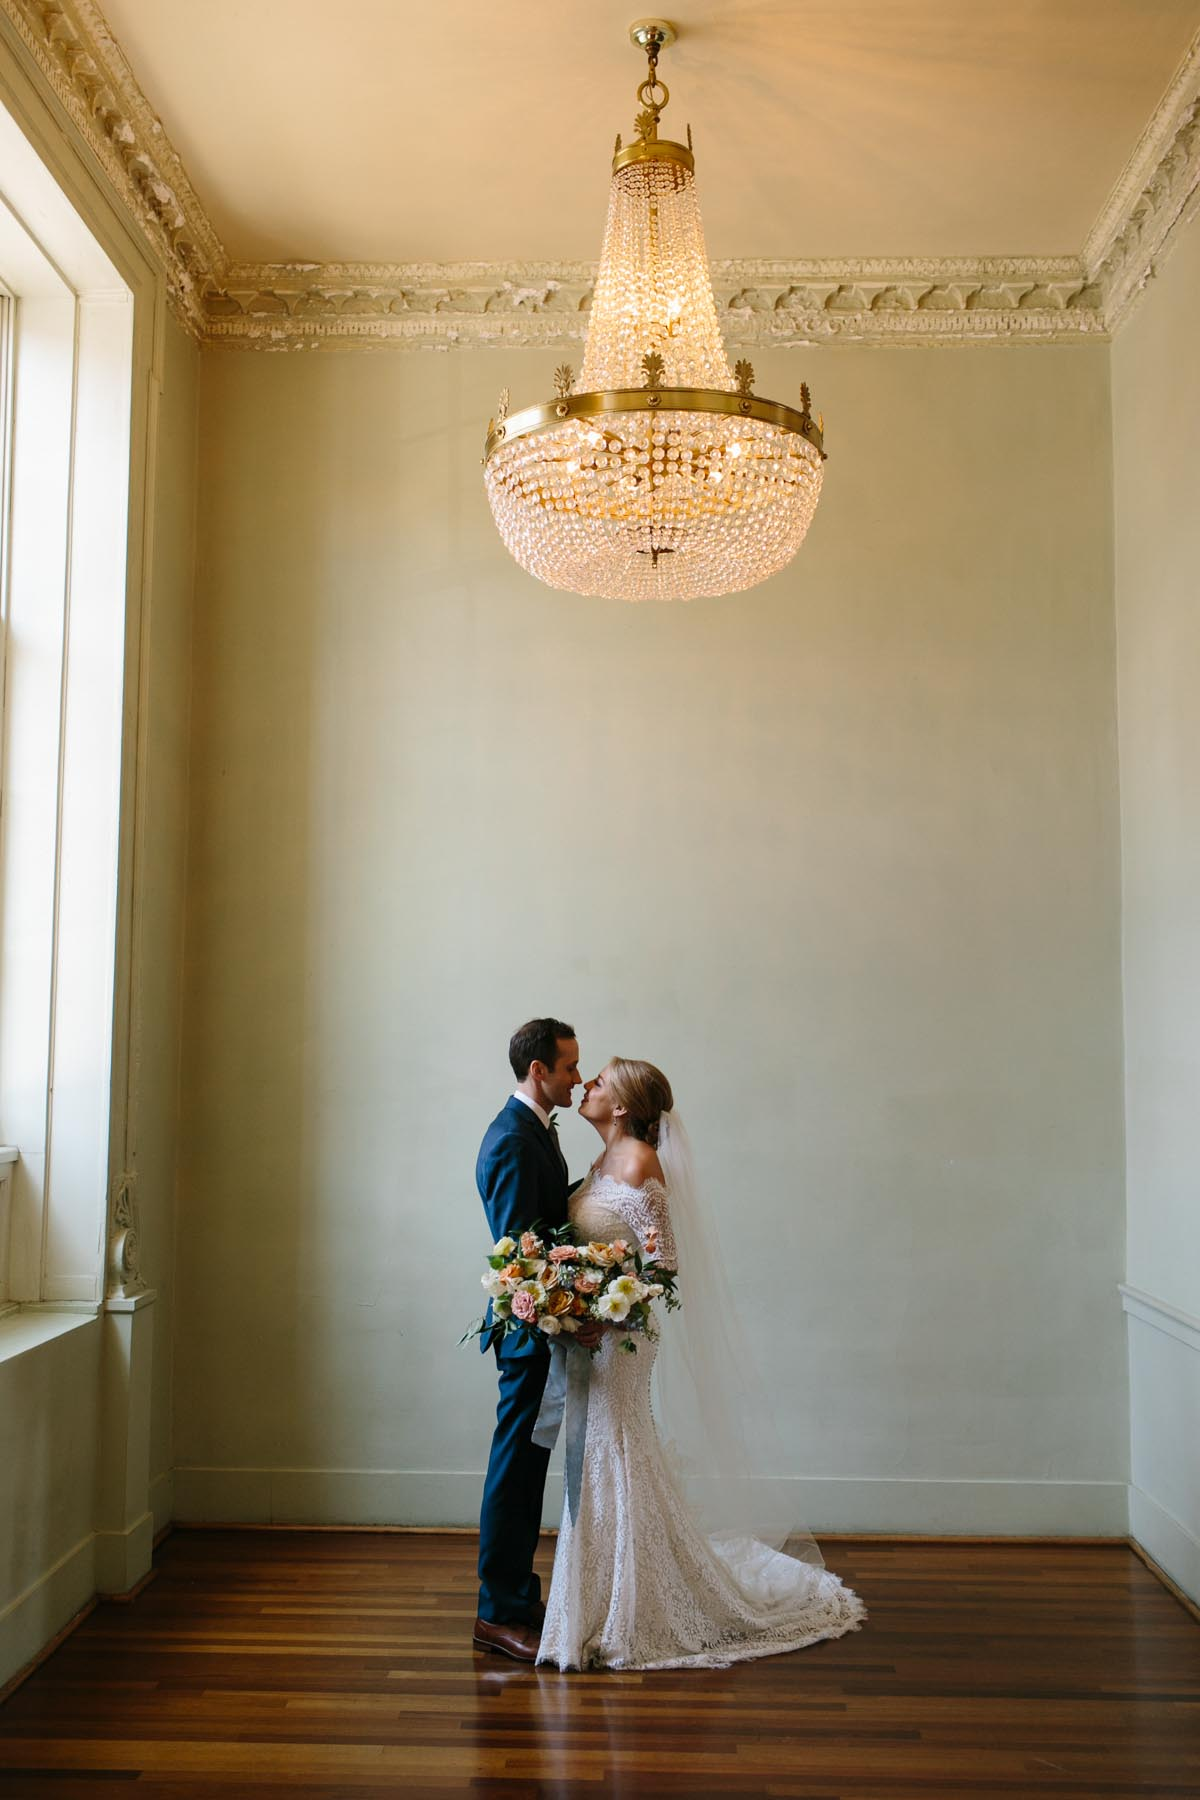 kjellman wedding blog biltmore wedding -41